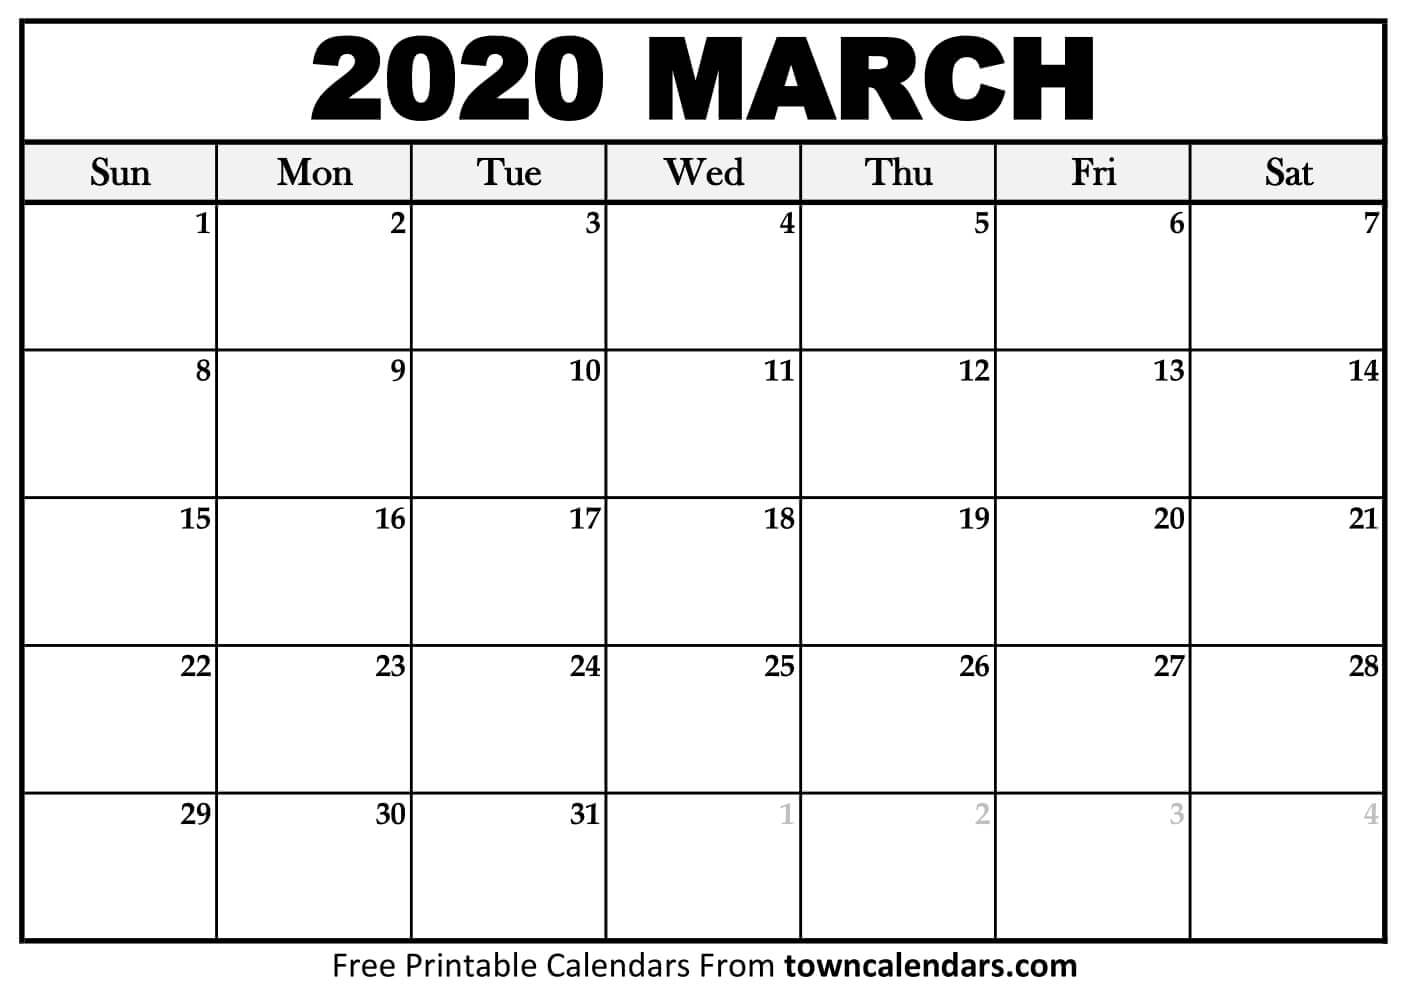 Printable March 2020 Calendar - Towncalendars